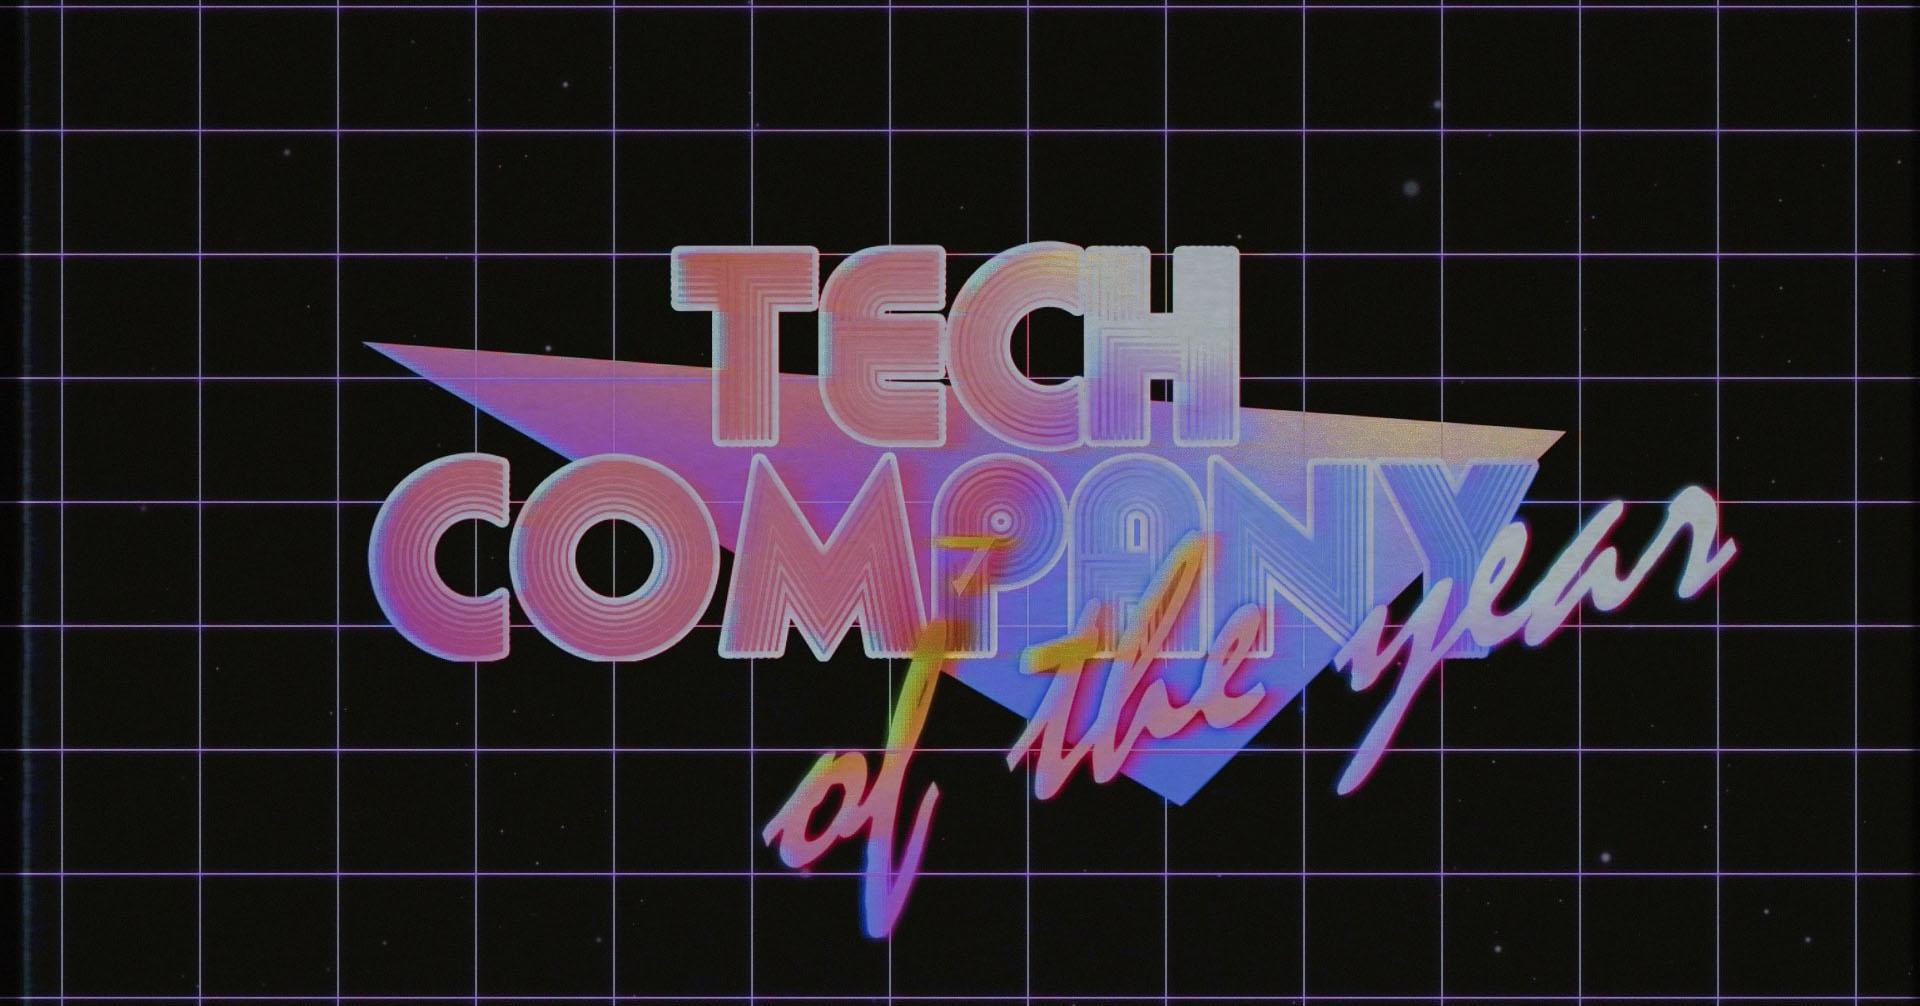 80s Award Show – Style 3